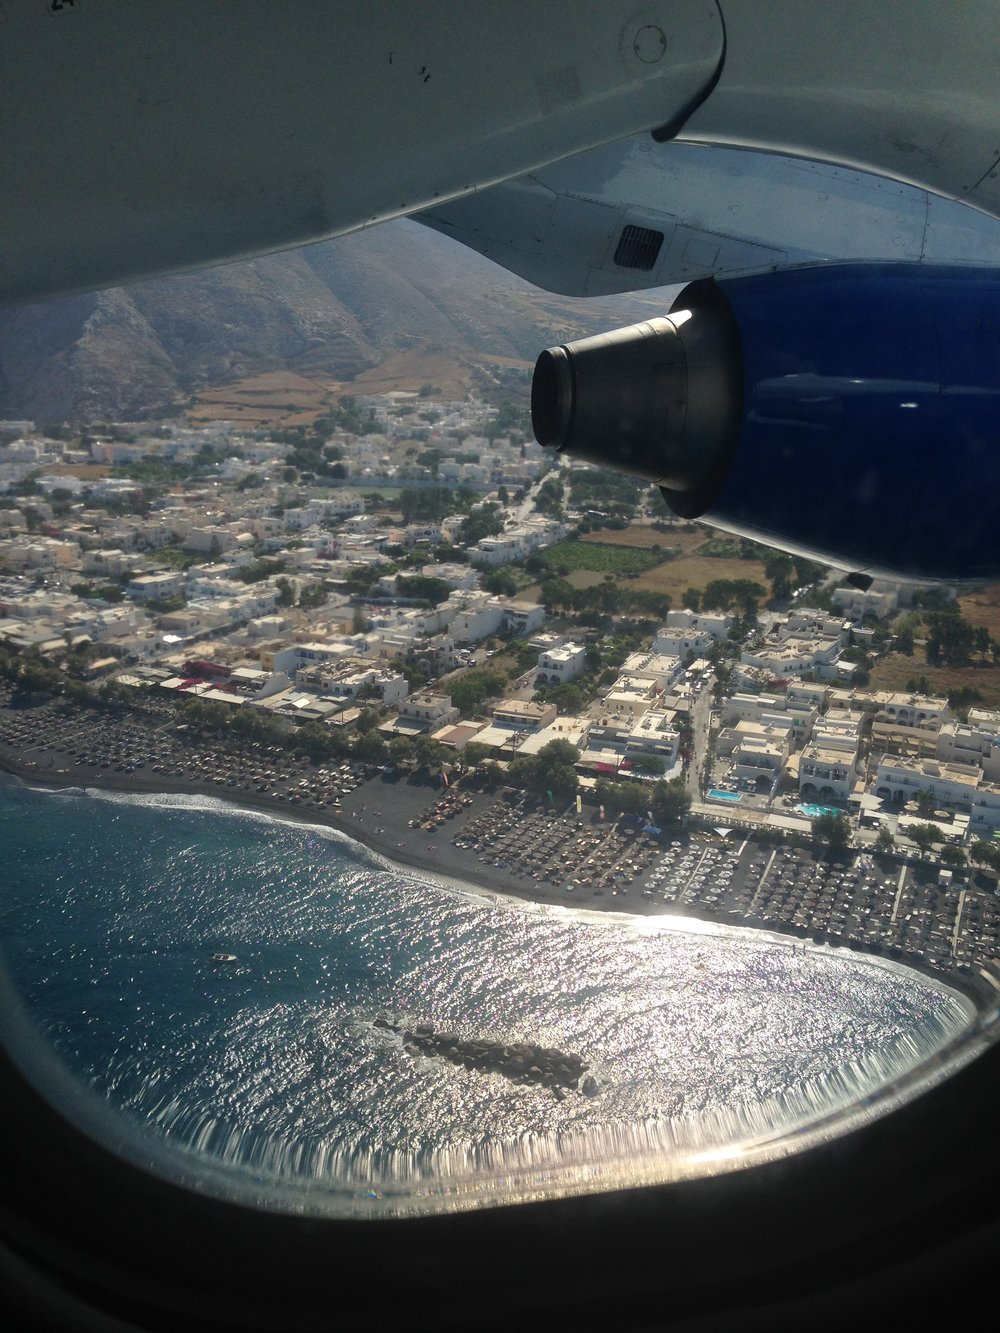 flight blog post holidays compassion